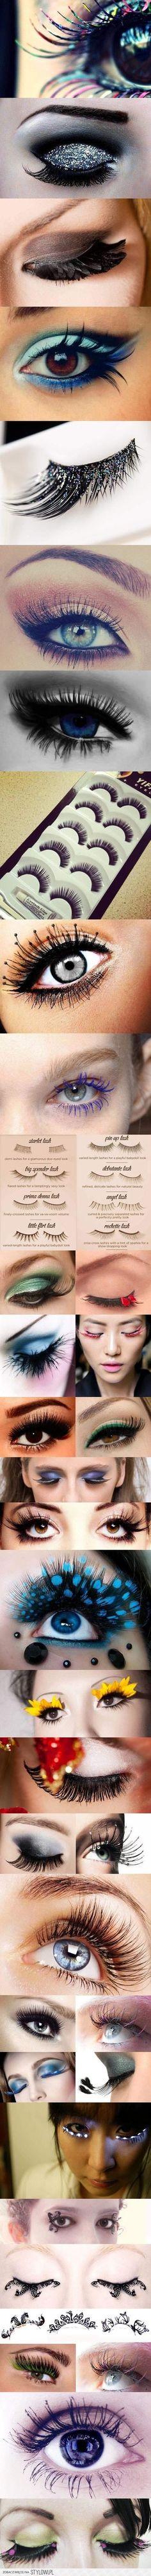 different lash looks! Just fabulous!